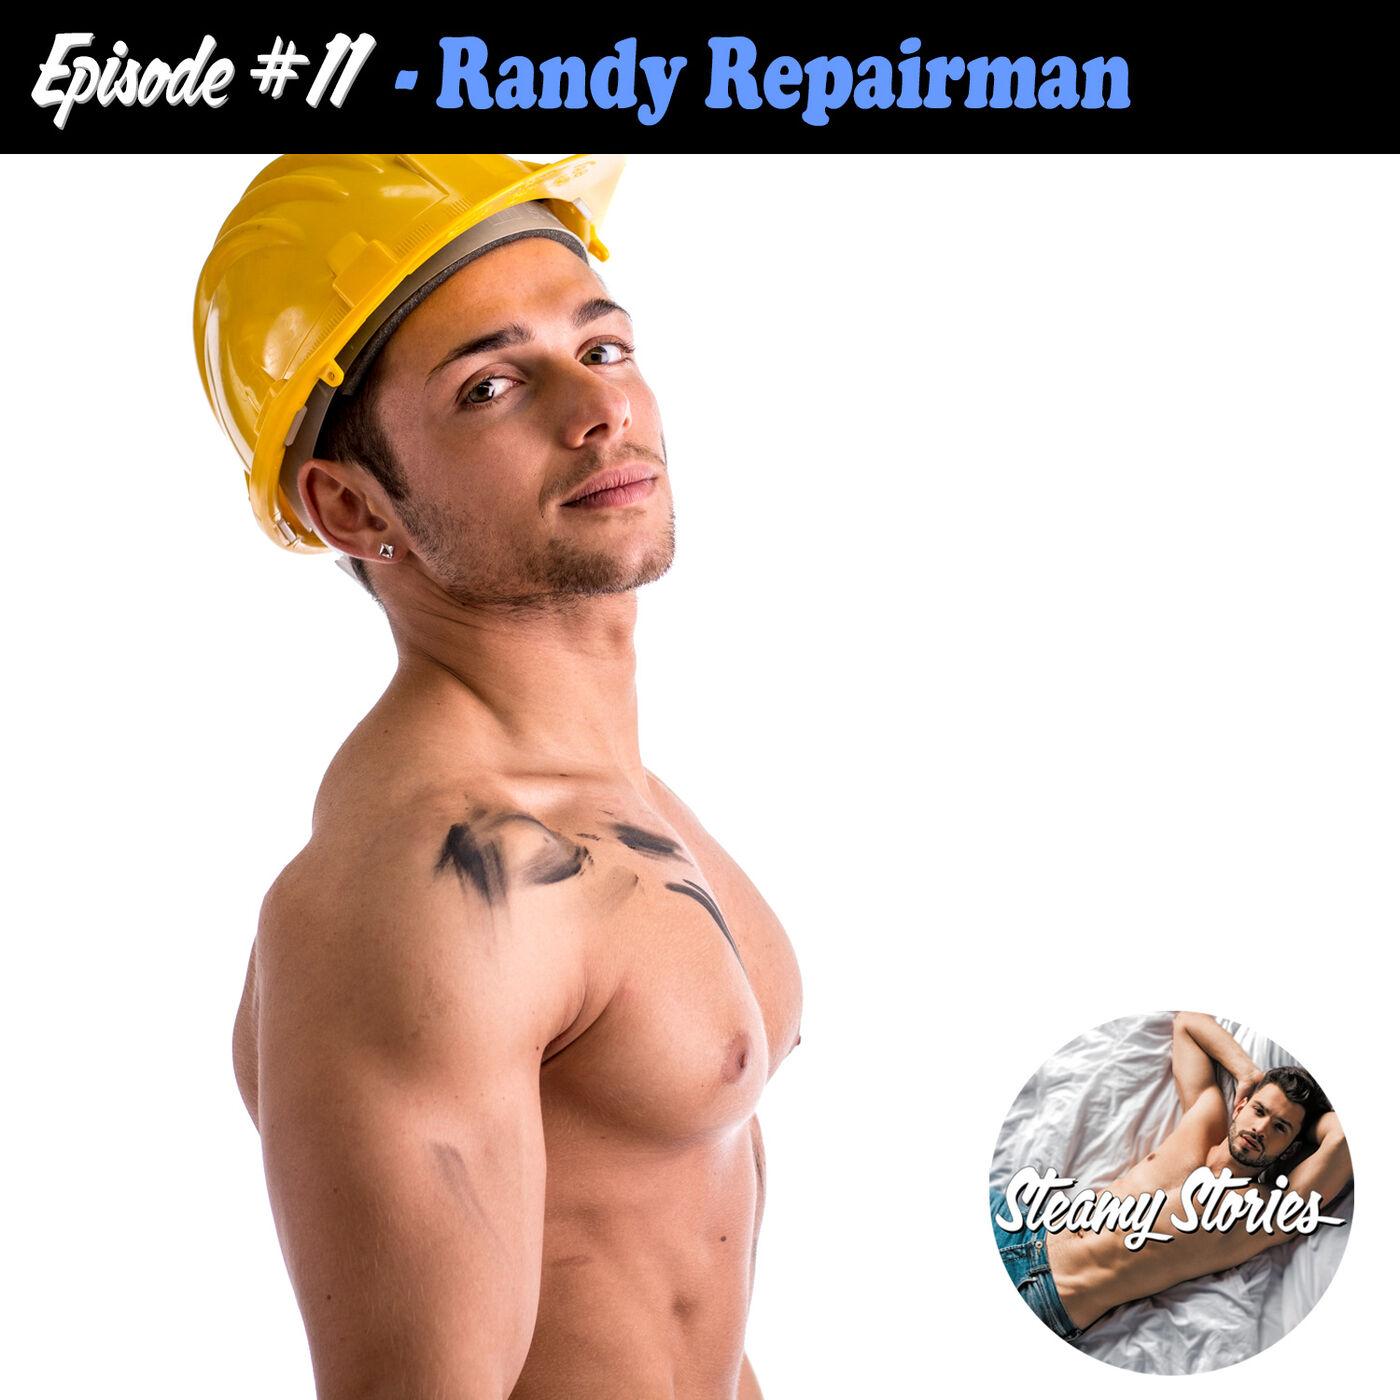 11. The Randy Repairman